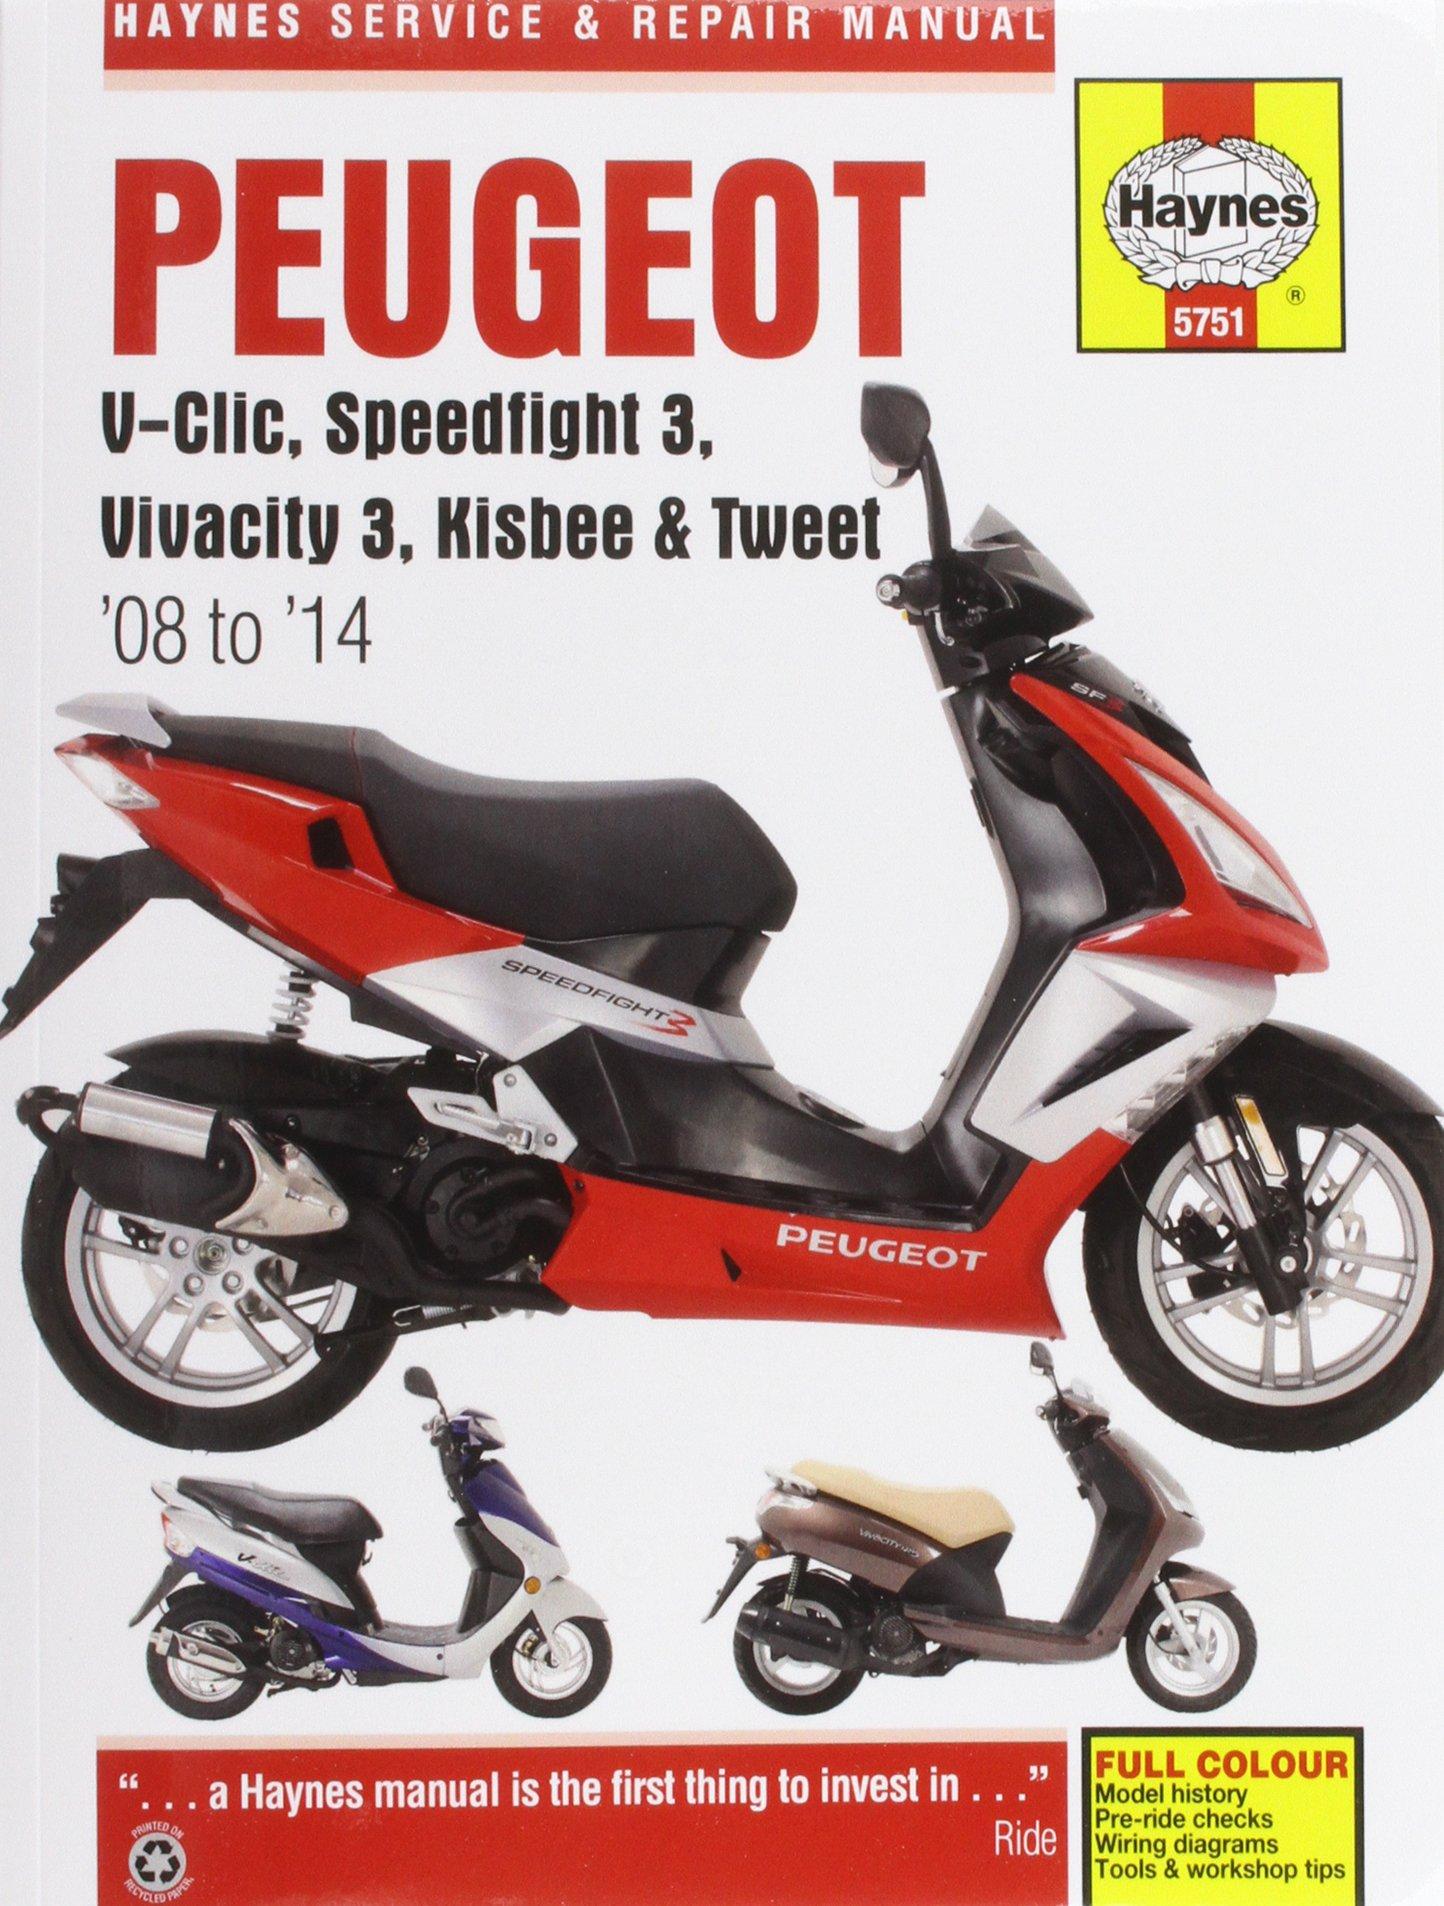 Peugeot V-Clic, Speedfight 3, Vivacity 3, Kisbee & Tweet 08 To 14 Haynes  Service & Repair Manual: Amazon.de: Phil Mather: Fremdsprachige Bücher